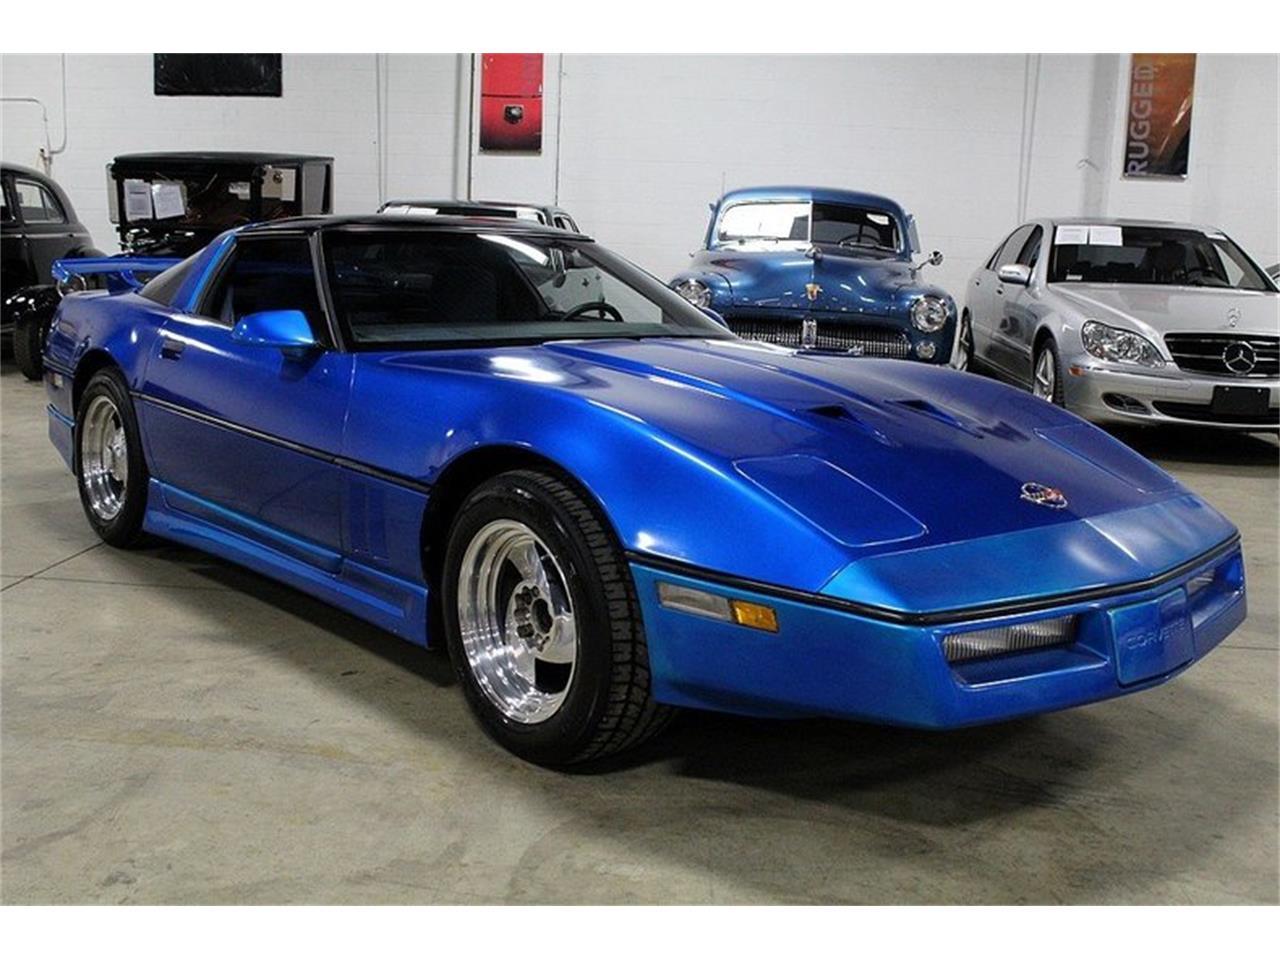 Large Picture of '85 Corvette - $9,900.00 - LBV1